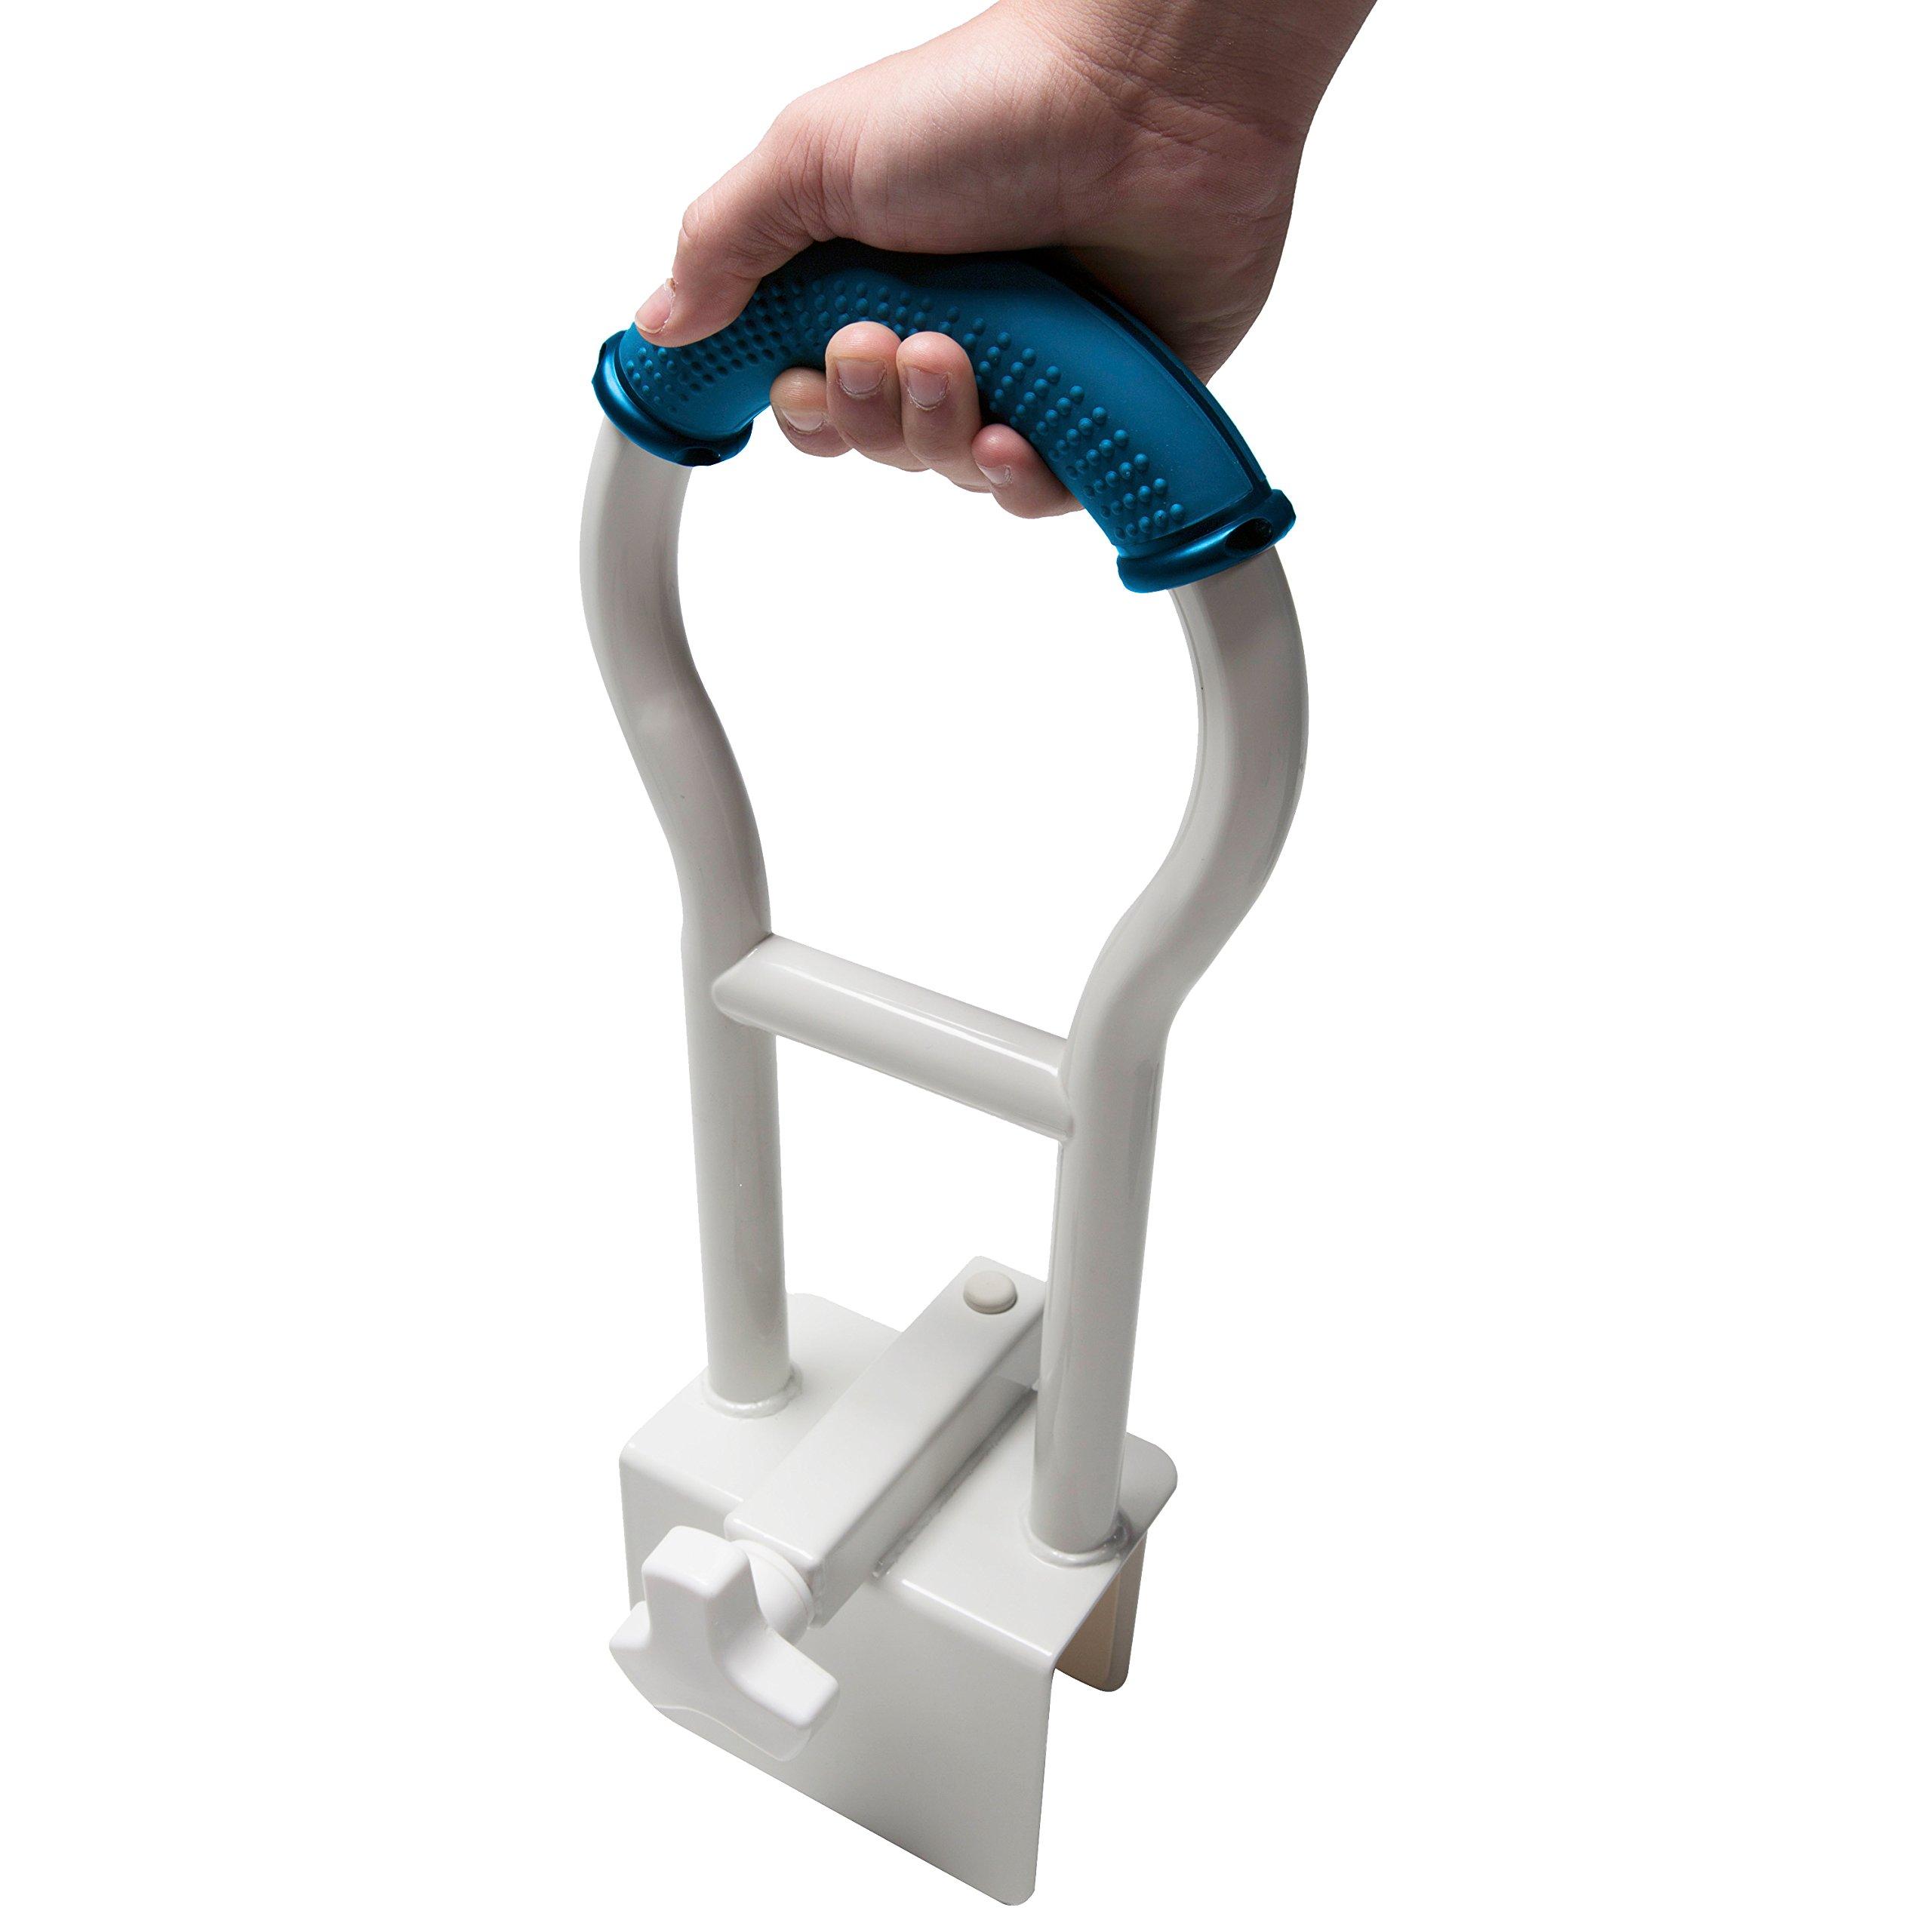 Pcp Bathtub Safety Rail with Sure-Grip, White/Blue, 19 inch